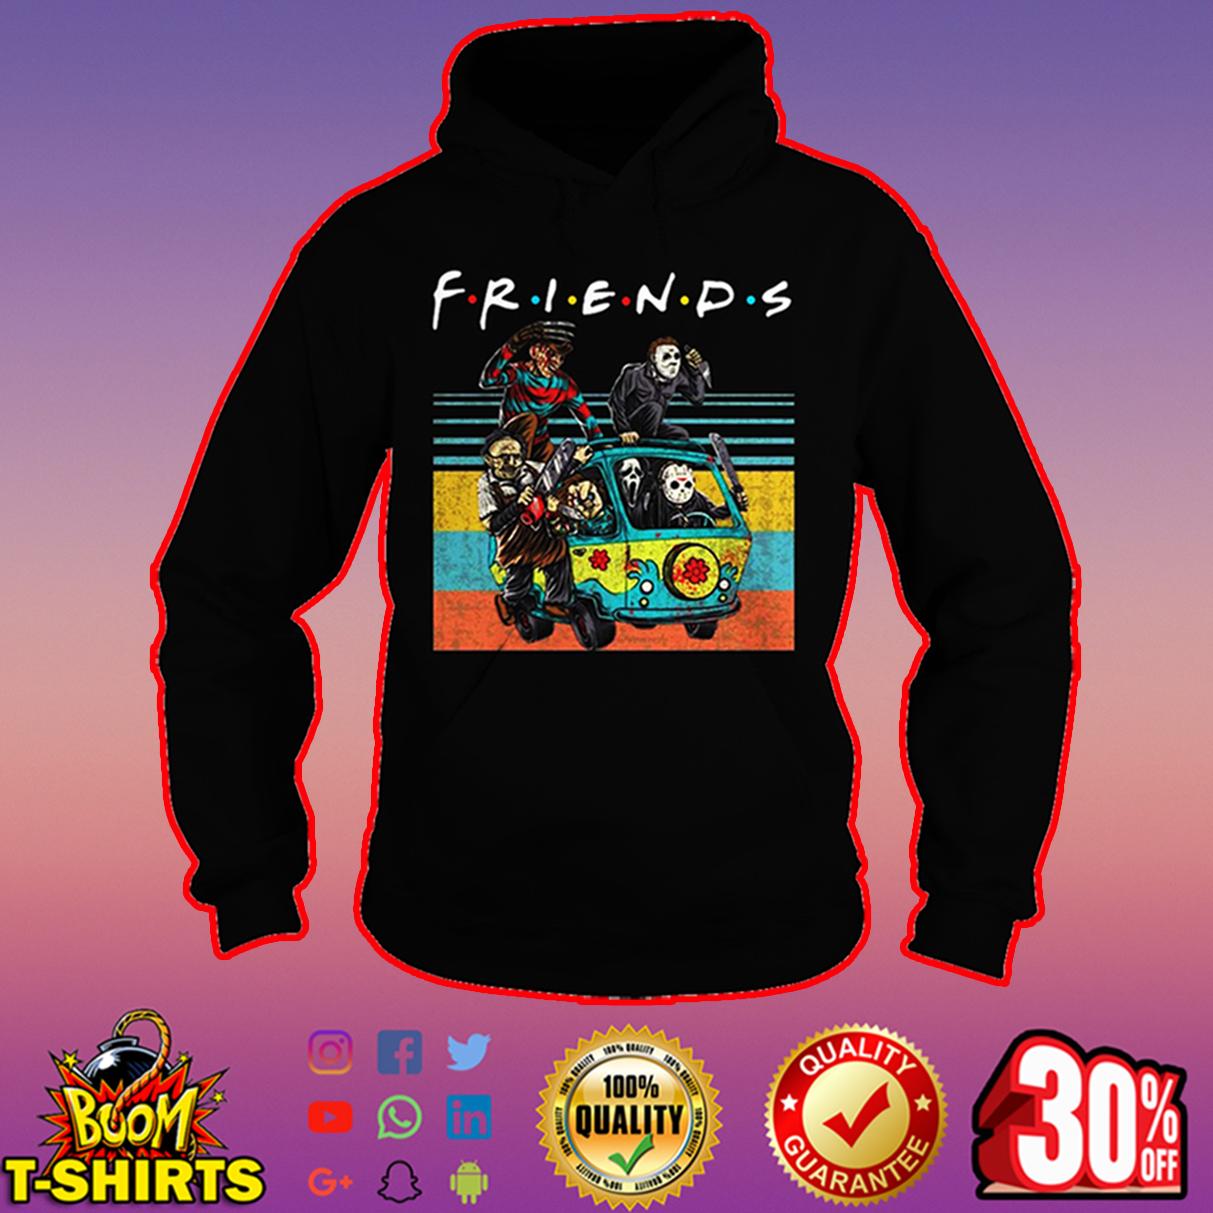 Freddy Krueger Michael Myers Leatherface Chucky Ghostface Jason Voorhees friends hoodie